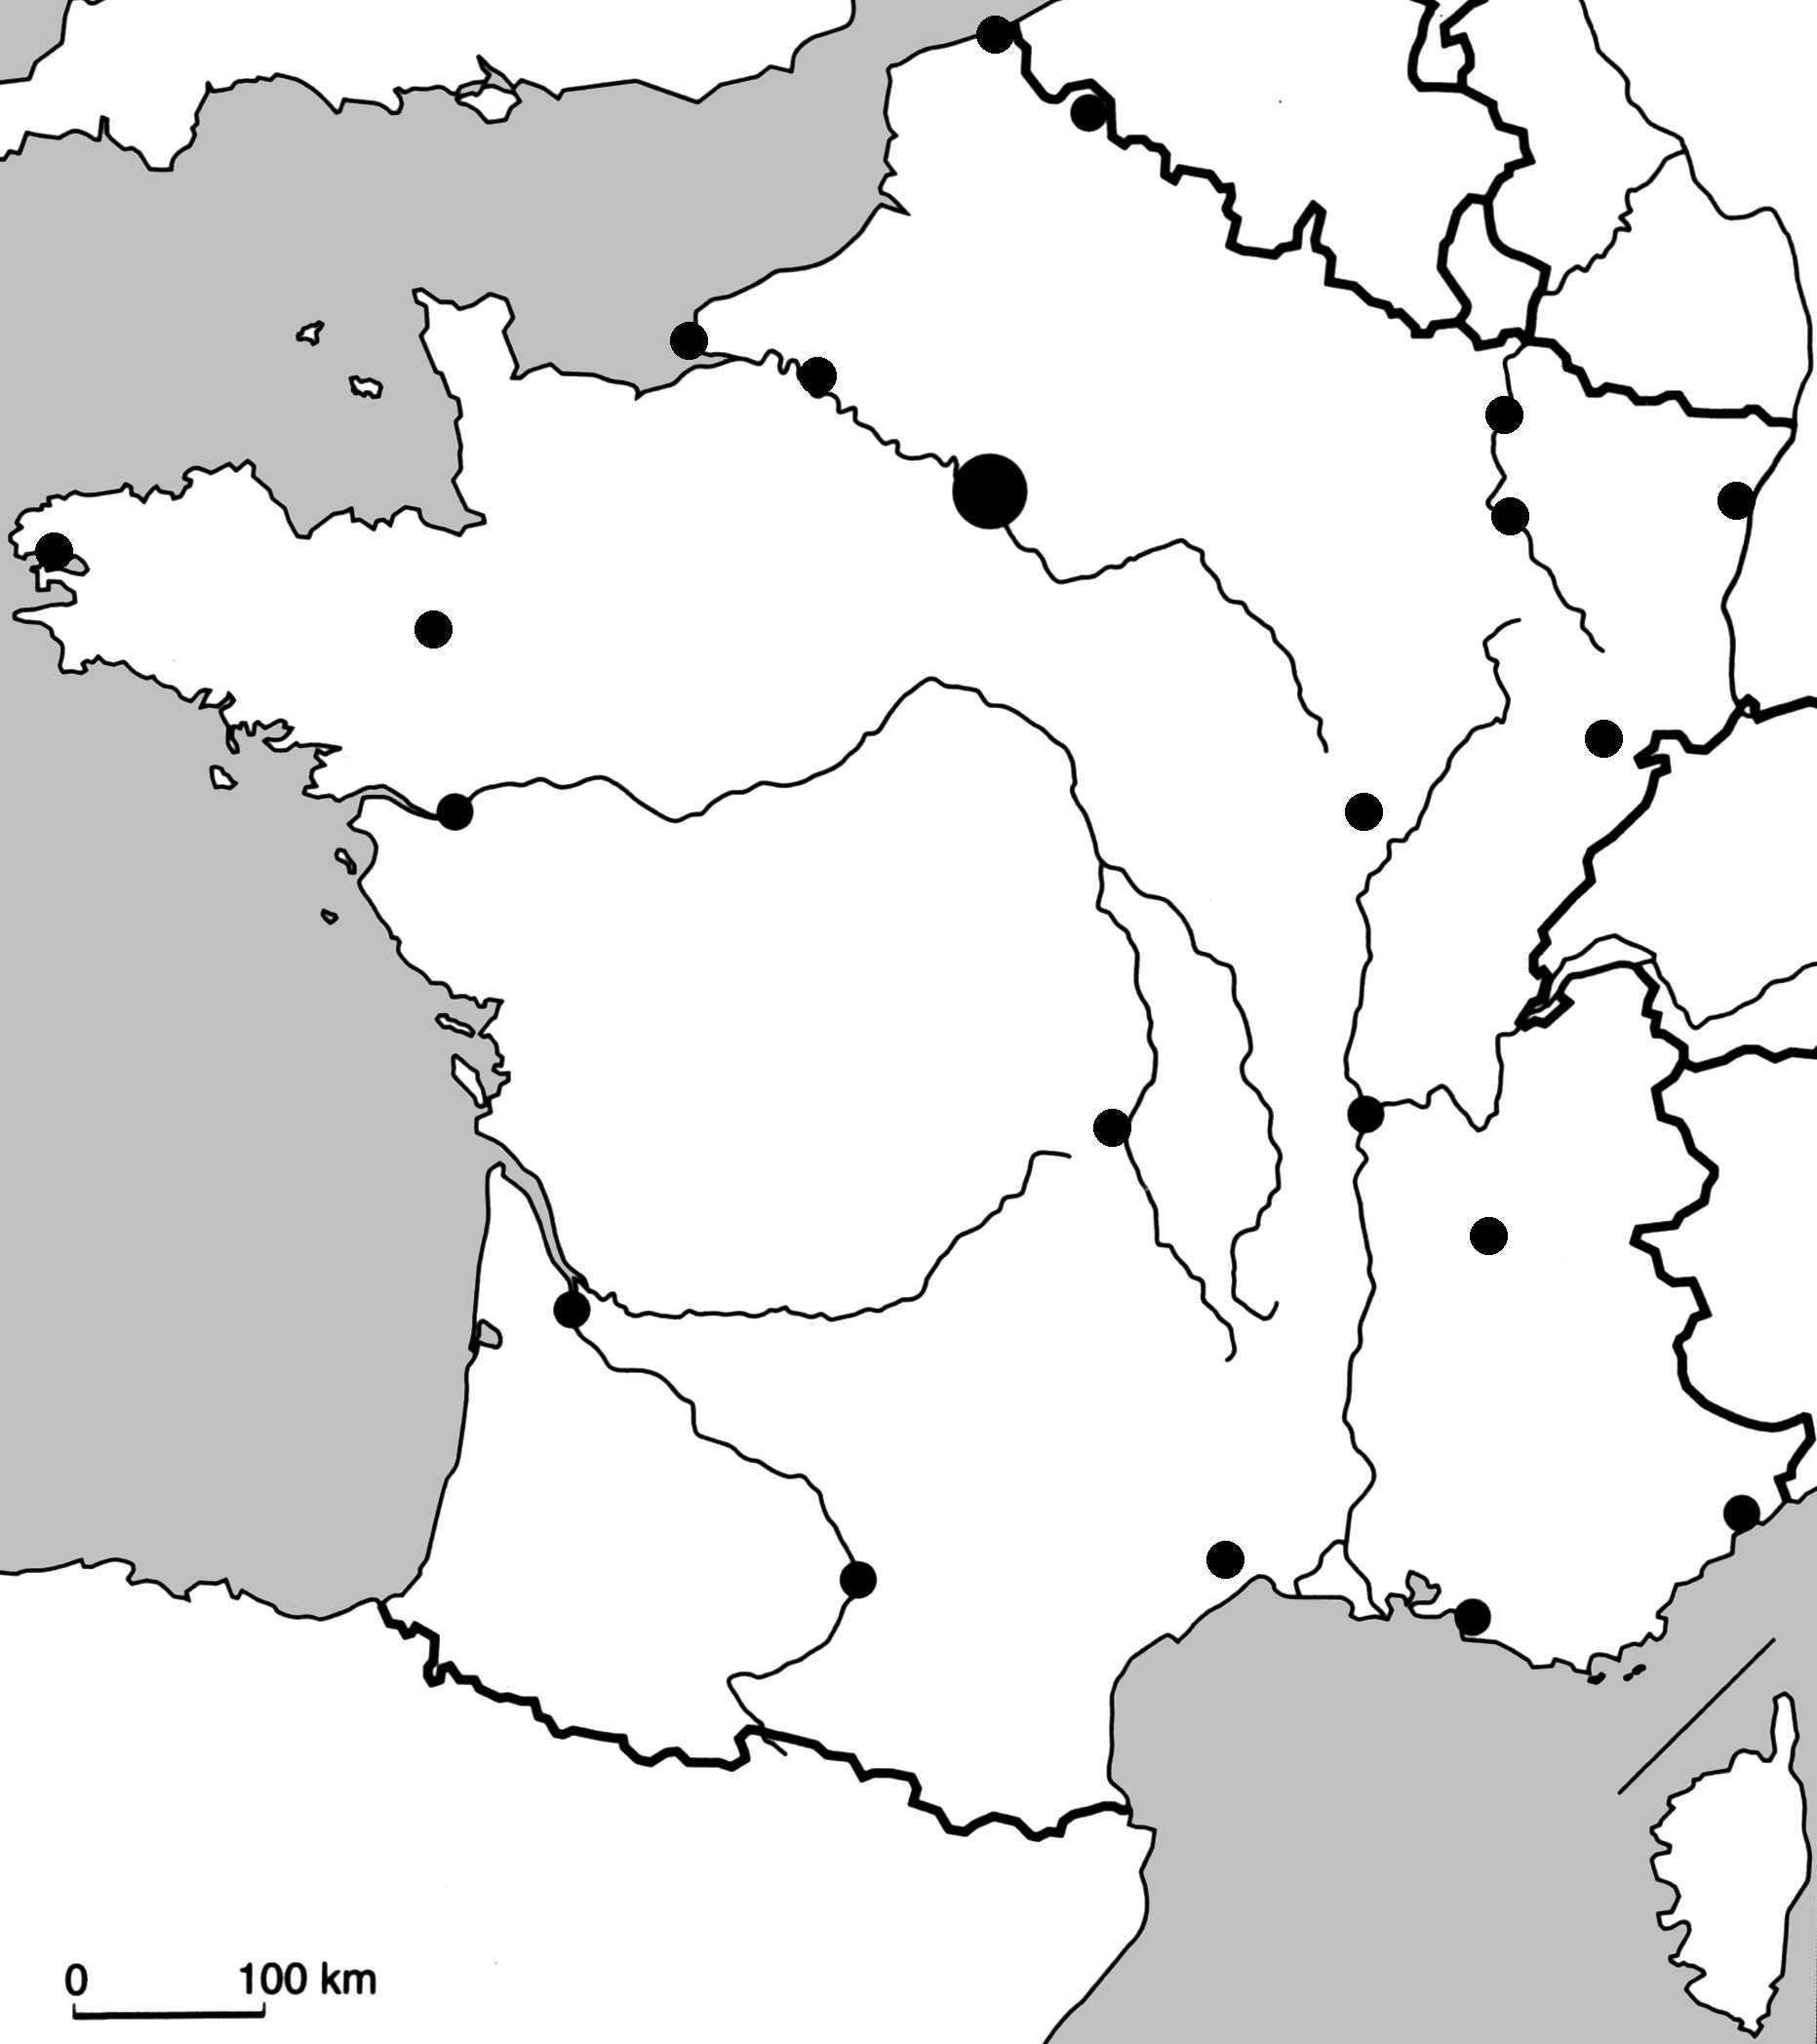 fleuve de france carte 4cartfrville. (1863×2096) | Carte france vierge, Fleuve de